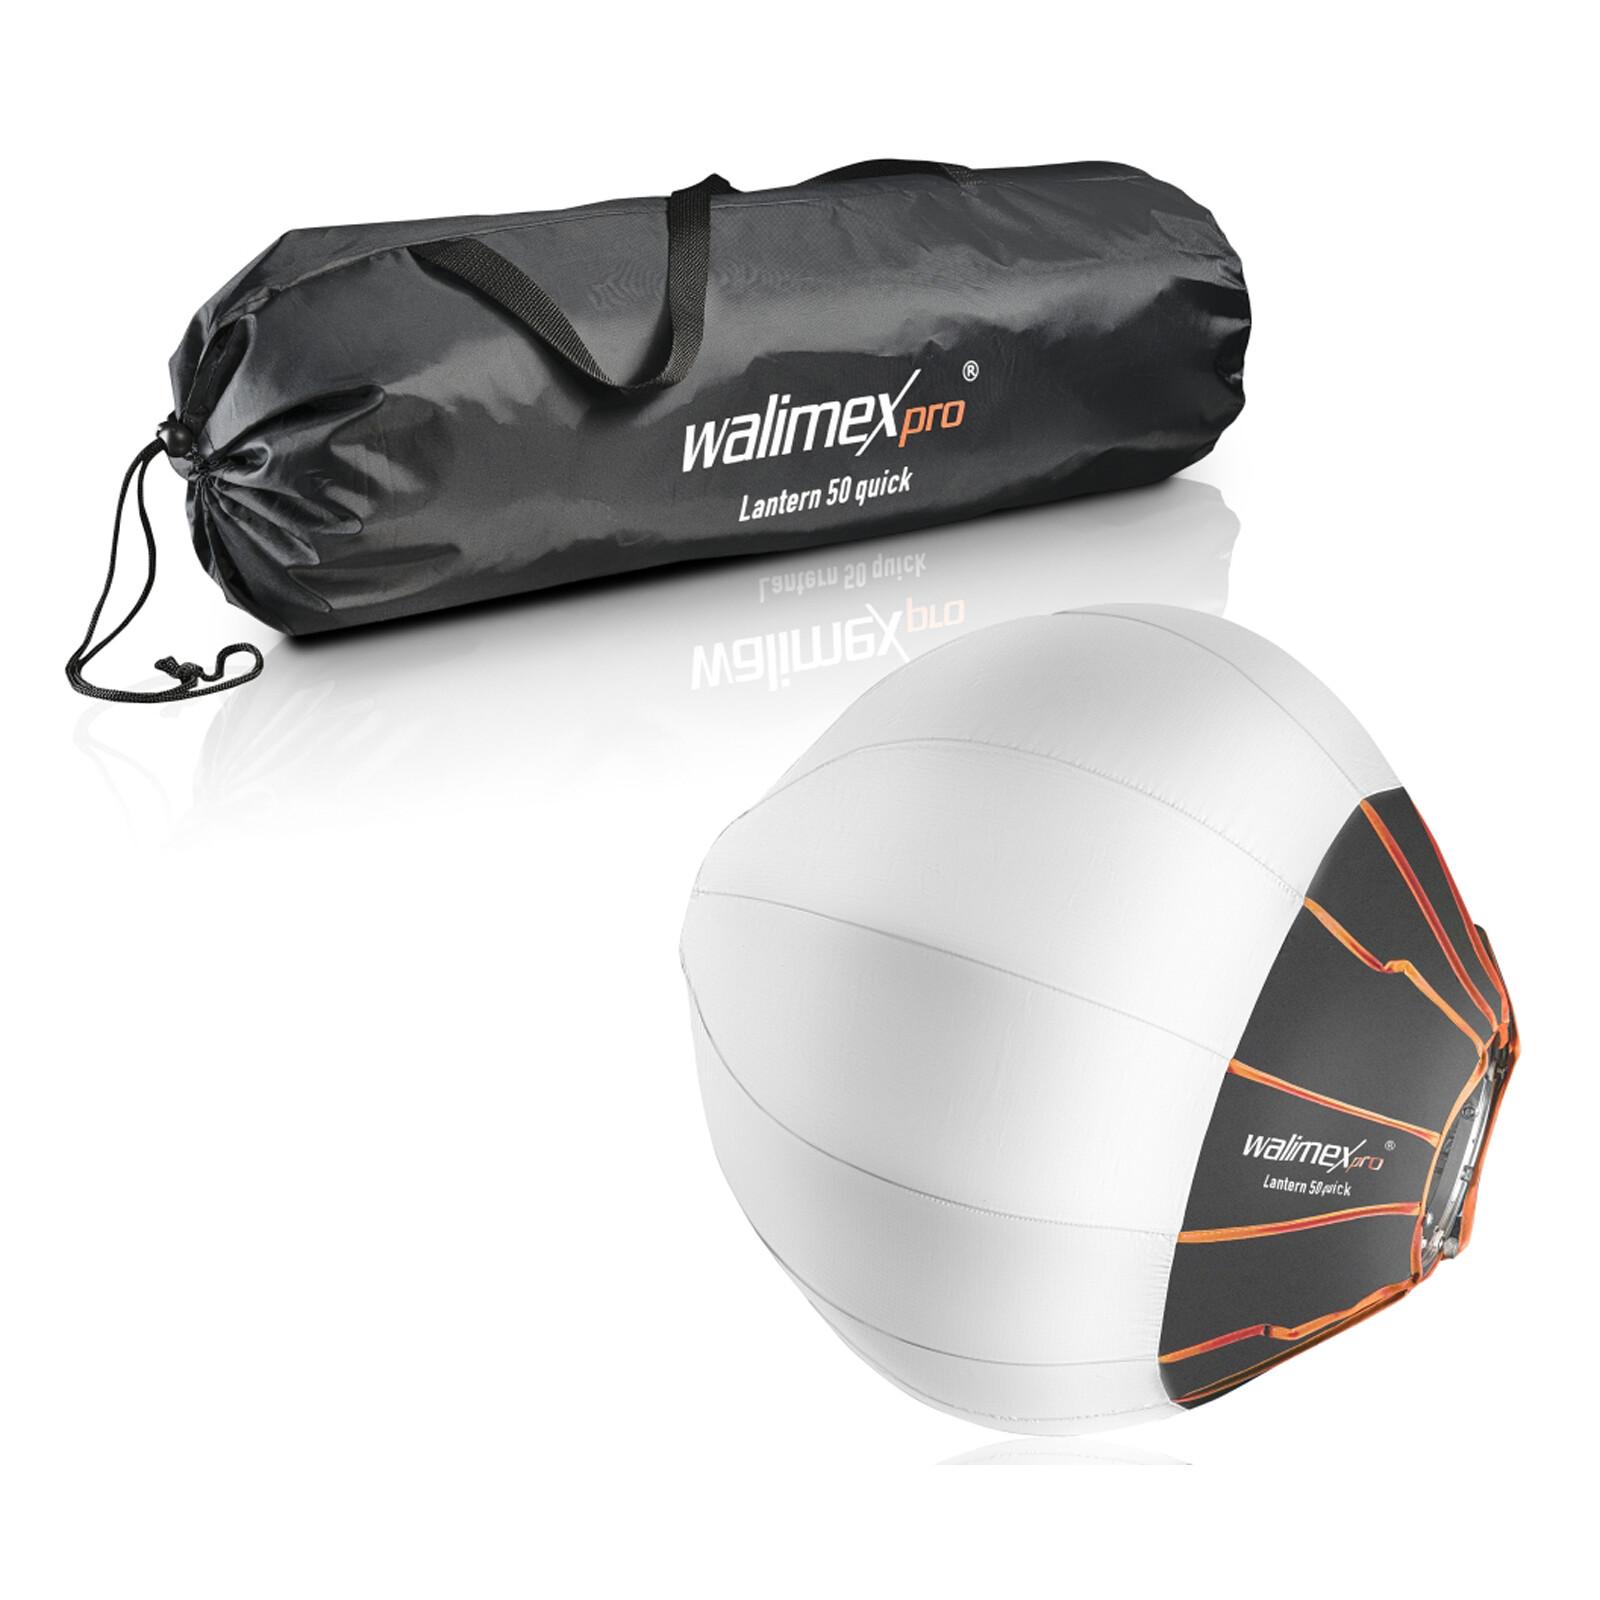 Walimex pro 360° Ambient Light Softbox 50cm Elinchrom